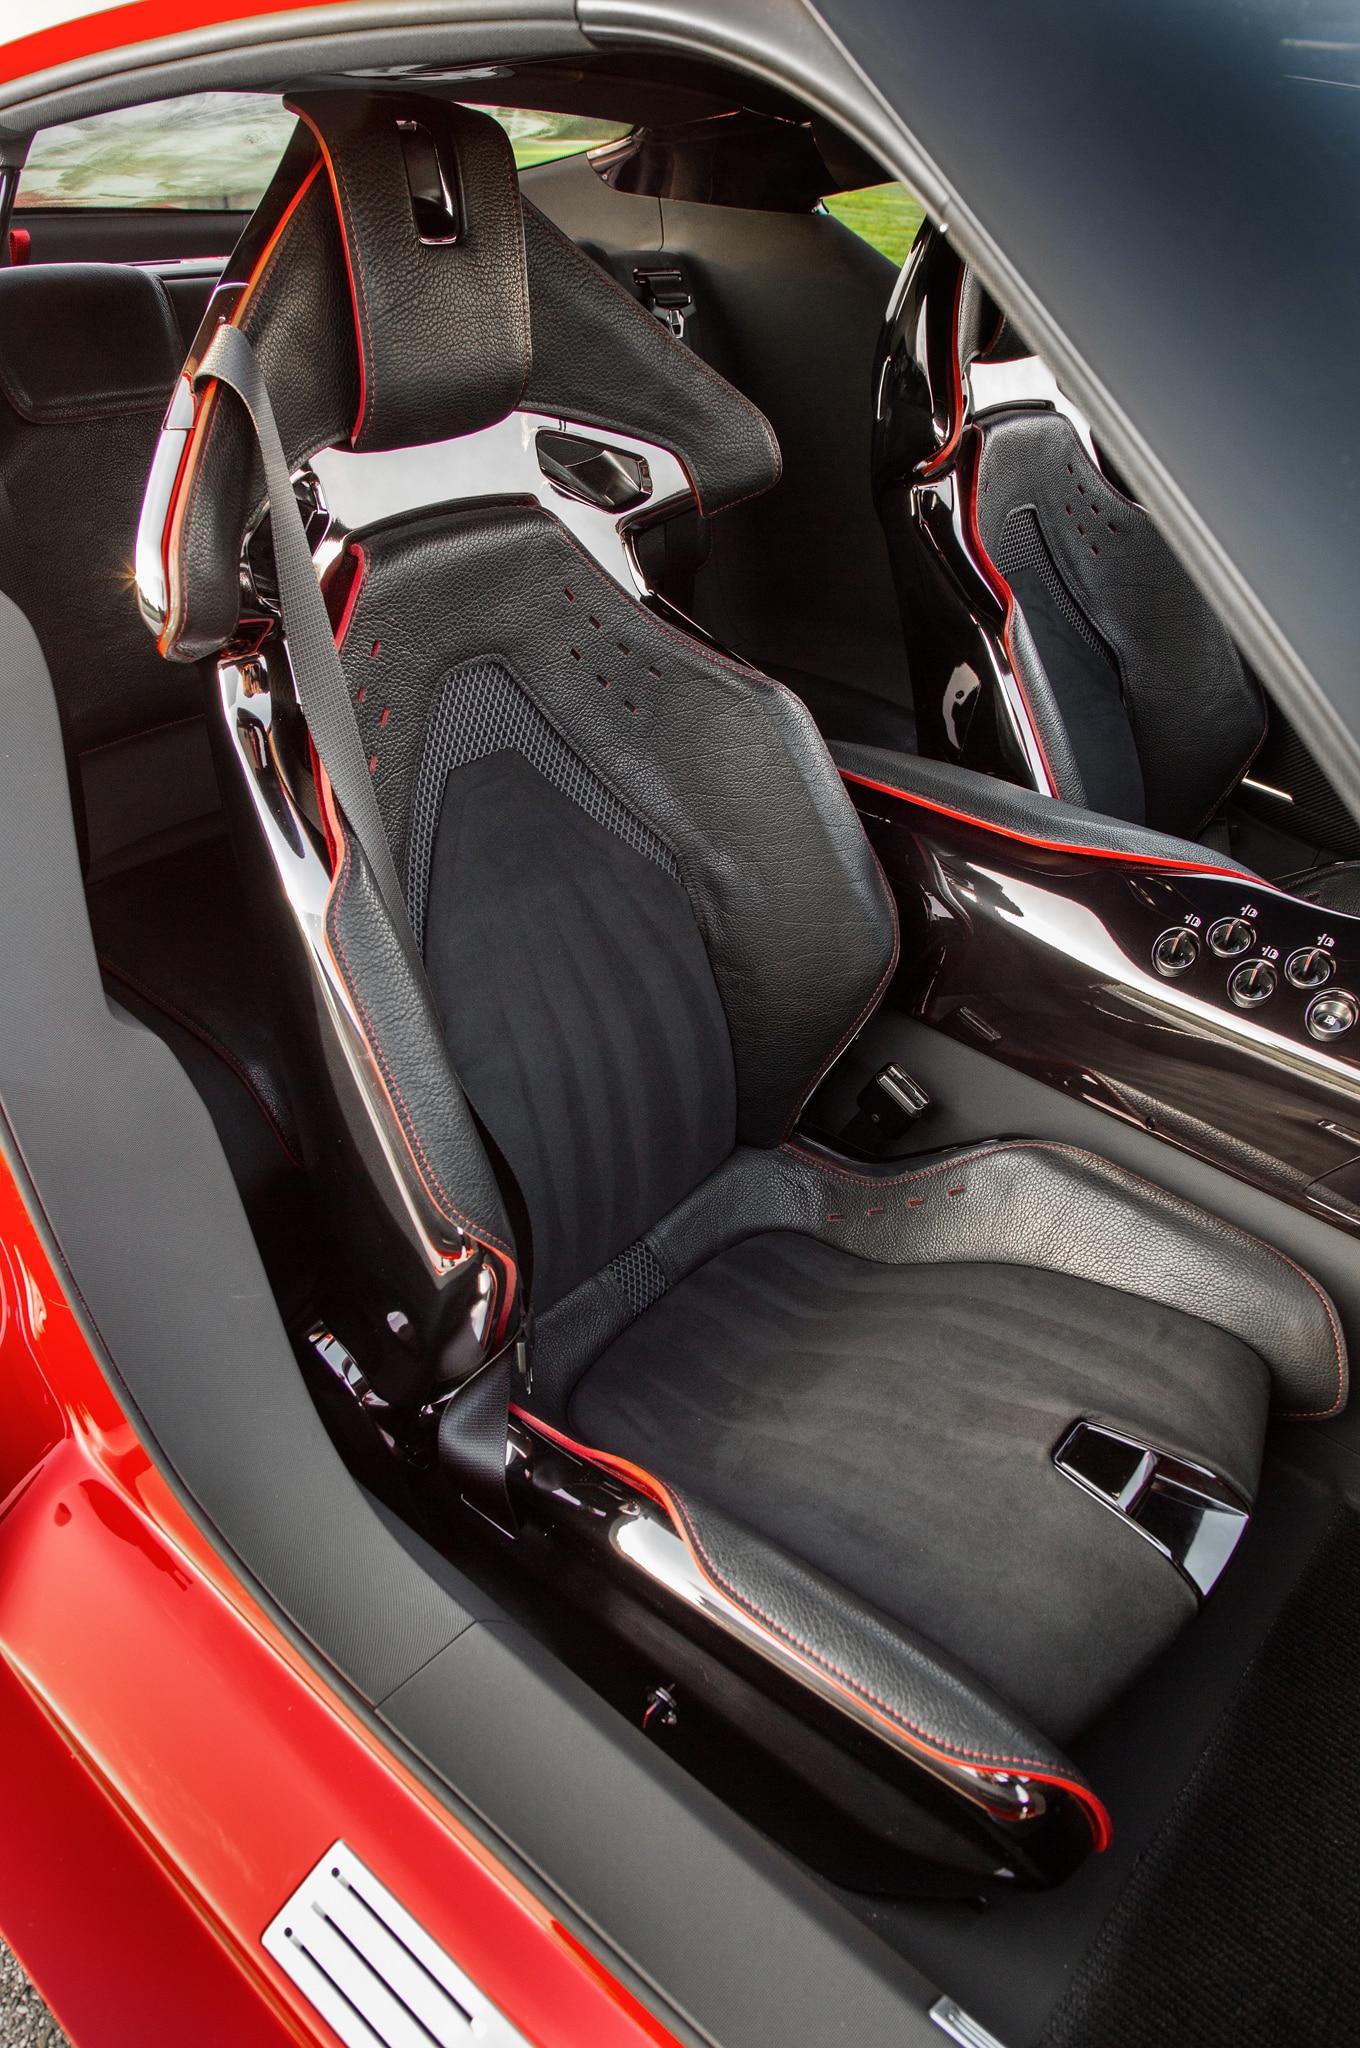 Supra Mk5 Interior : supra, interior, Toyota, Chief, Engineer, Wants, Supra, Joint, Sports, Photo, Image, Gallery